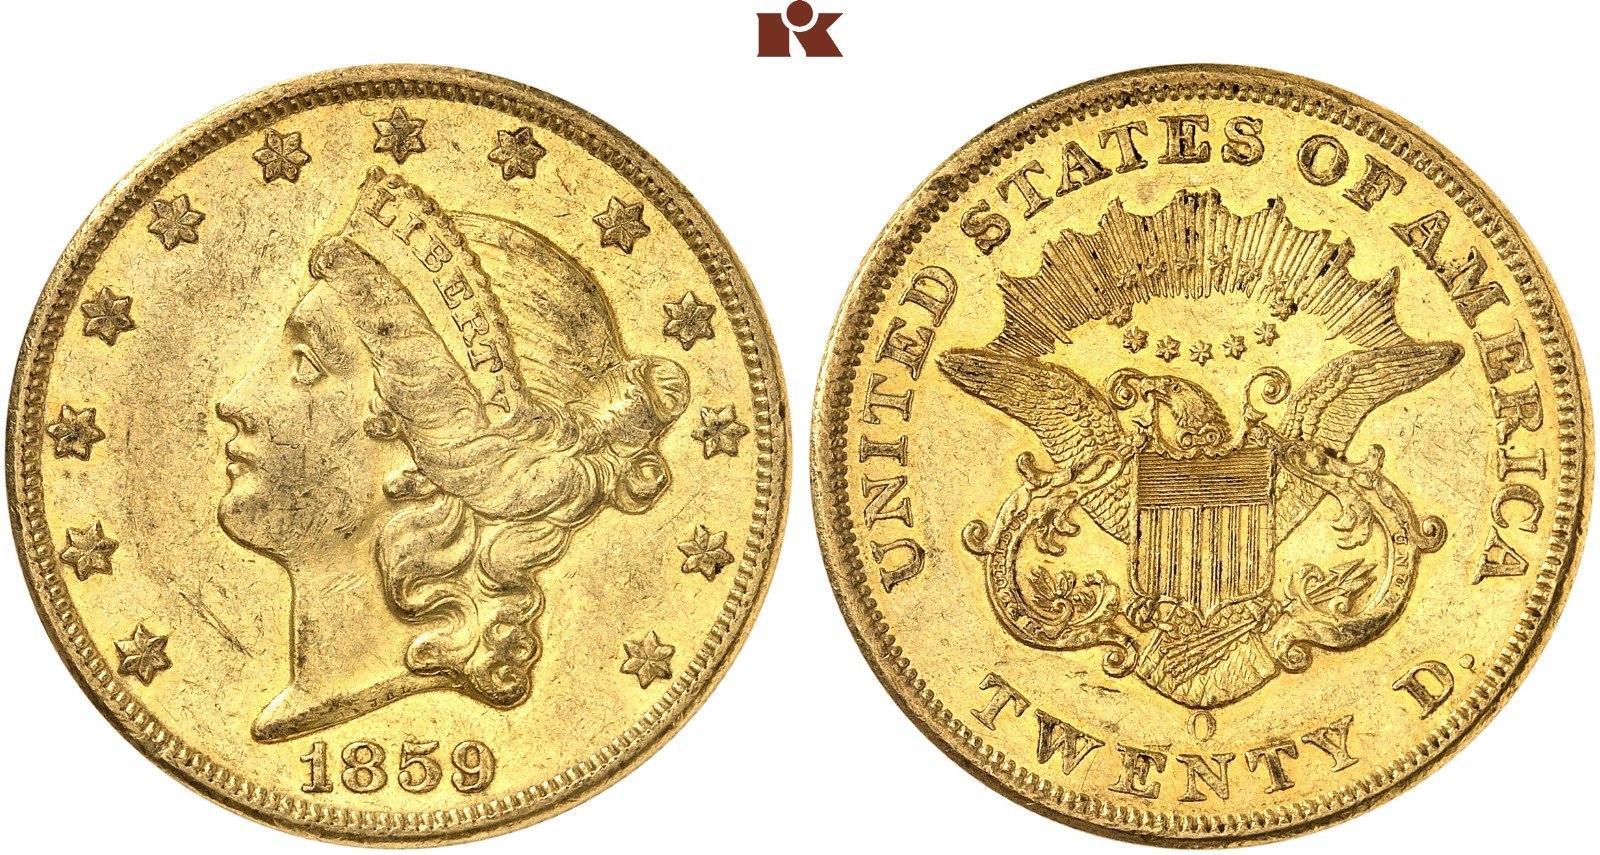 20-dlares-1859o.-rematado-en-104.550-euros.-fritz-rudolf-kuenker